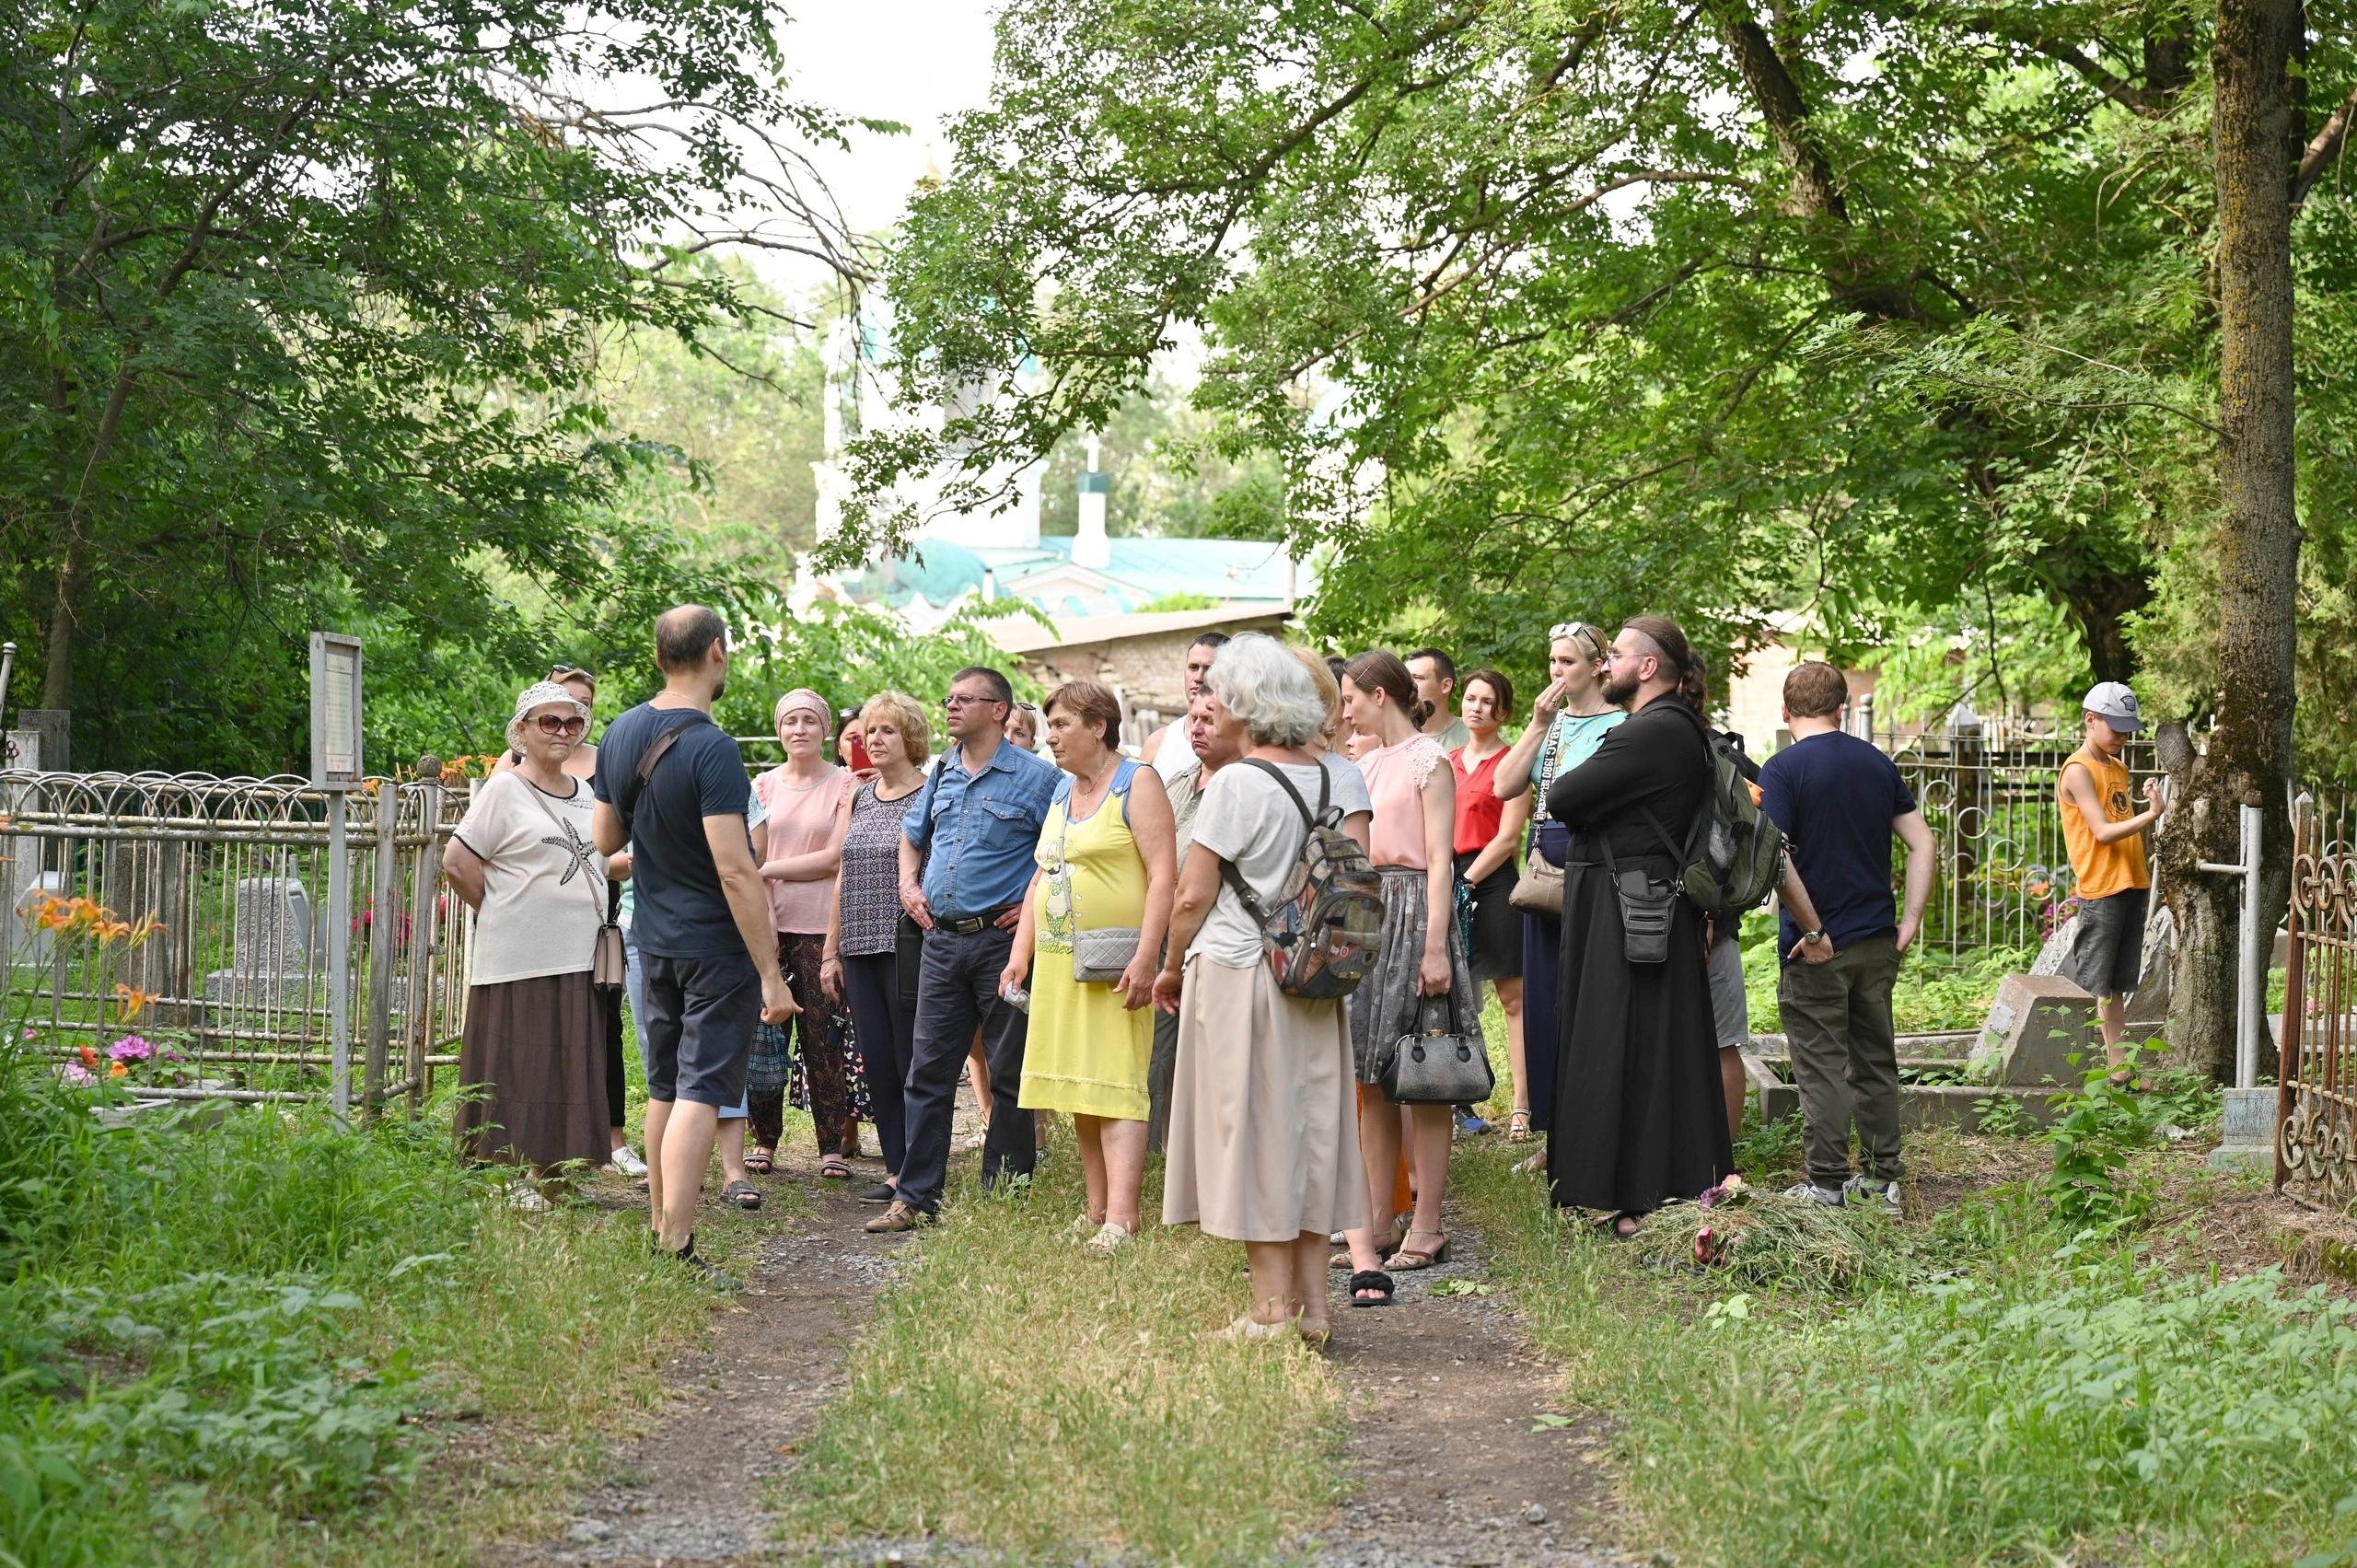 Экскурсия по старому кладбищу Таганрога, президентский грант